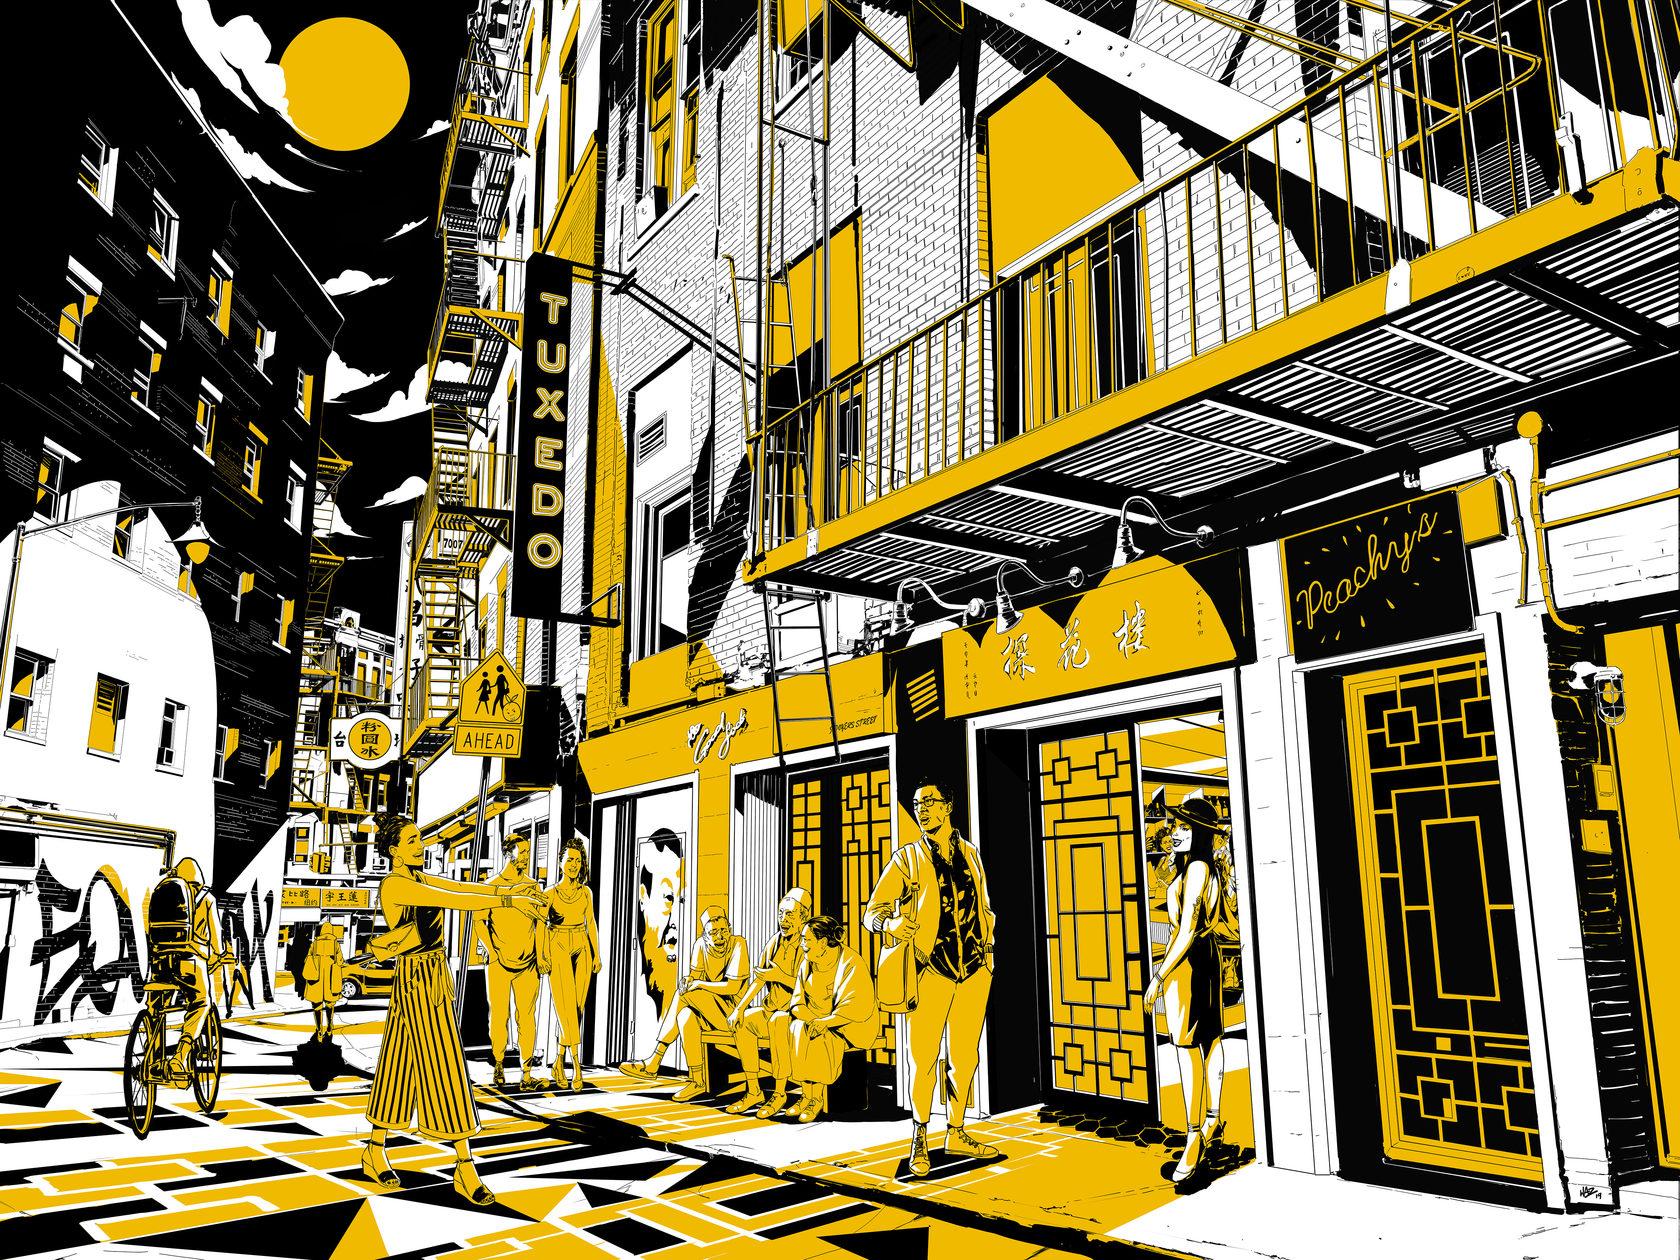 Doyers Street scene animation